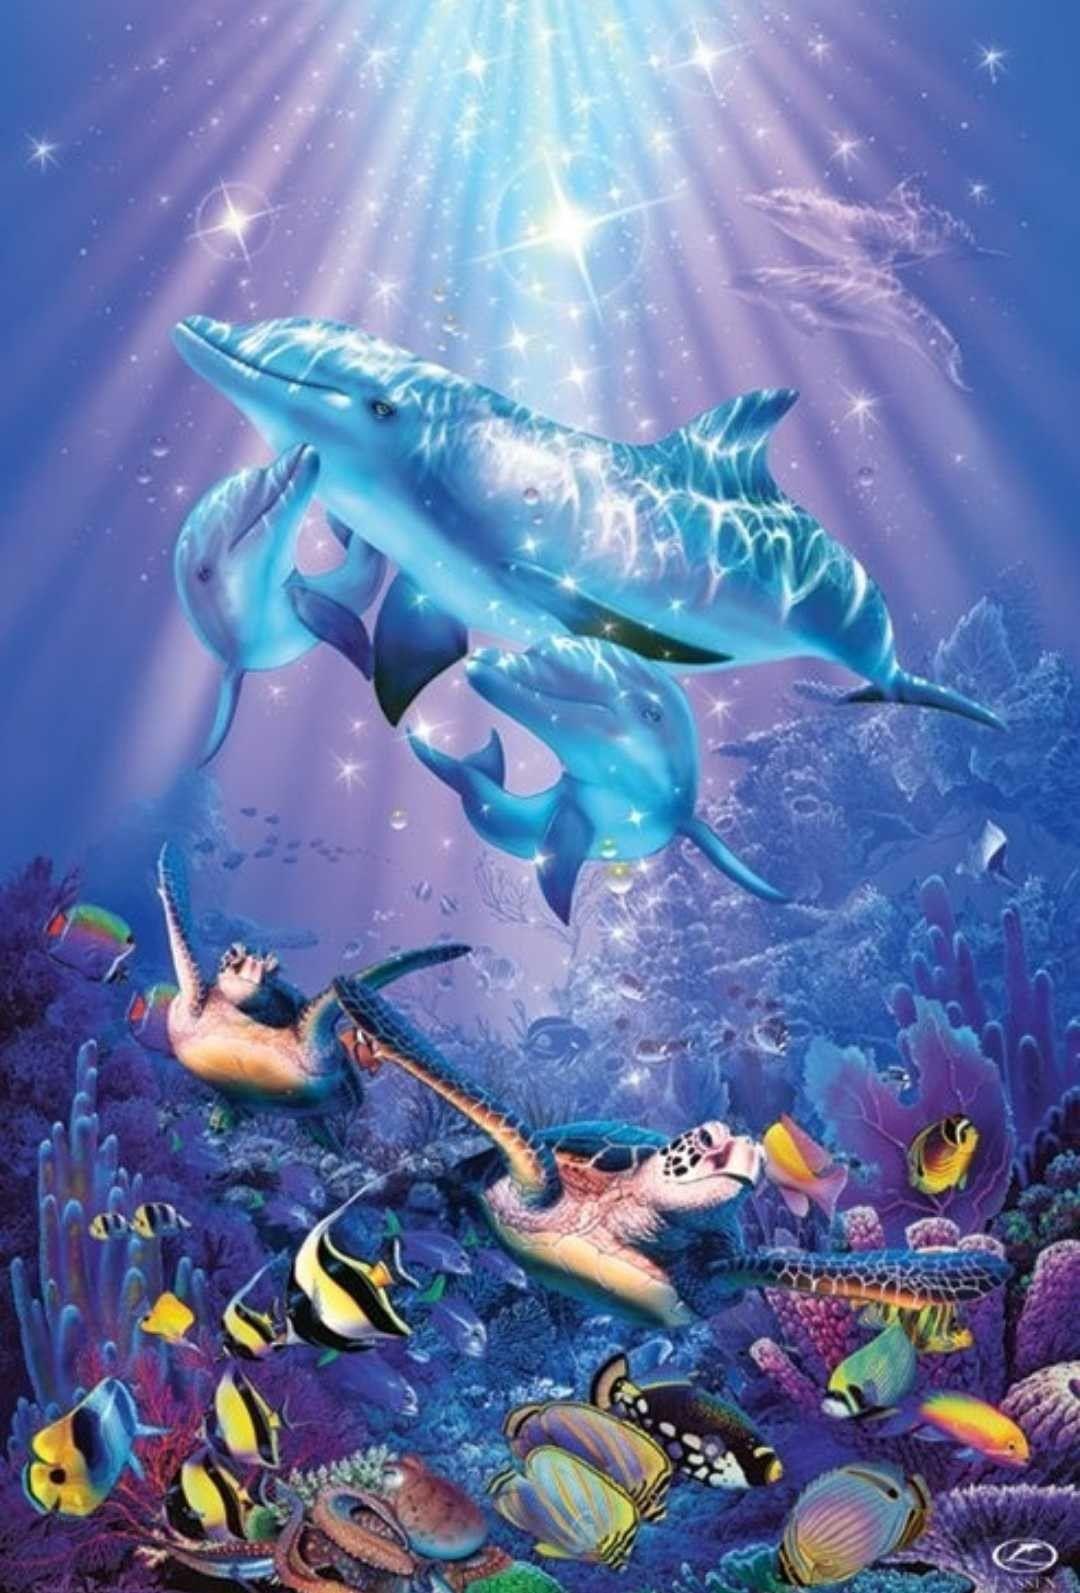 Idea by mary kinsinger on animals1 in 2020 dolphin art